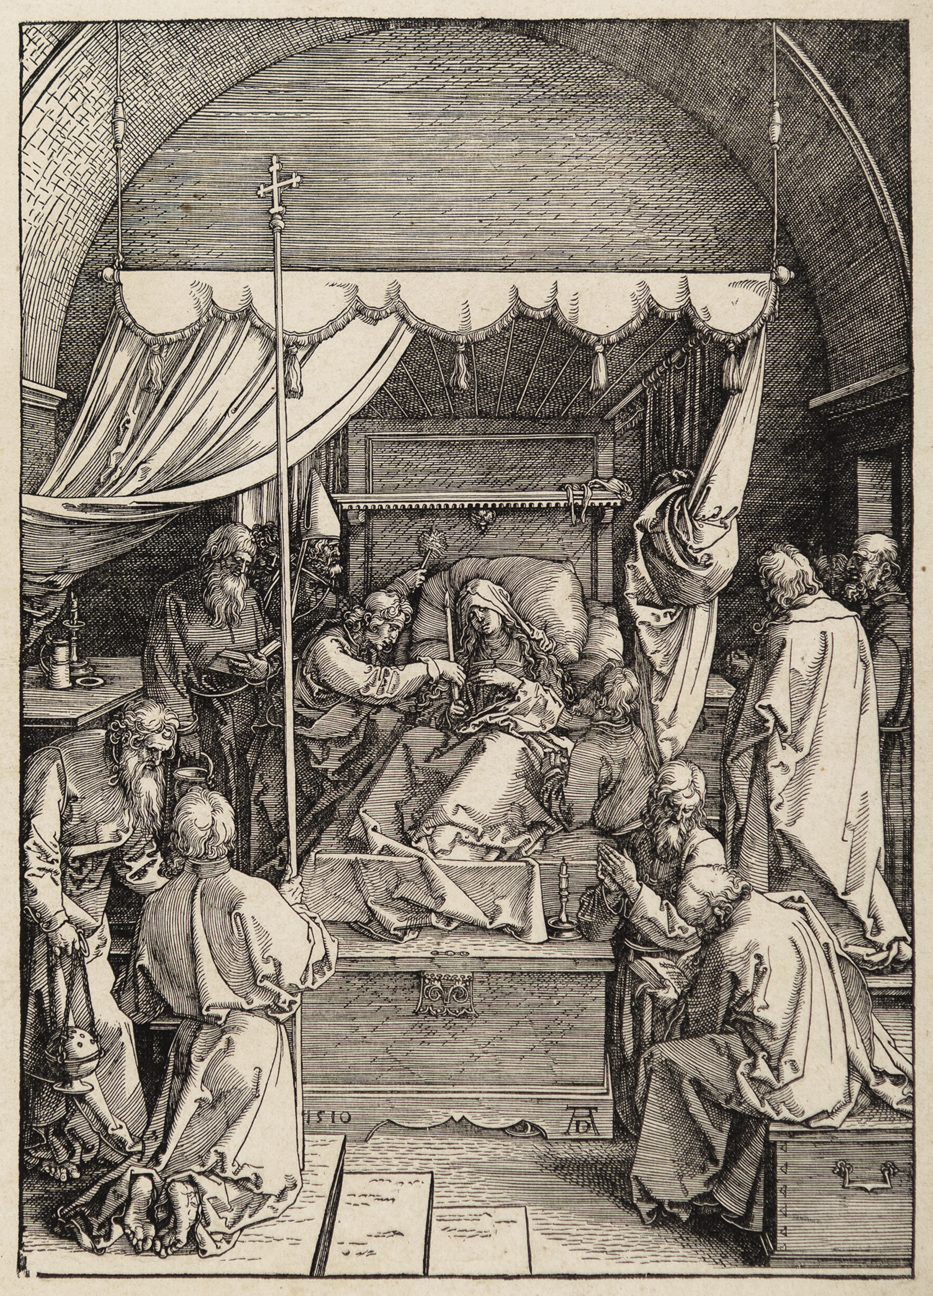 The Death of the Virgin by Albrecht Durer